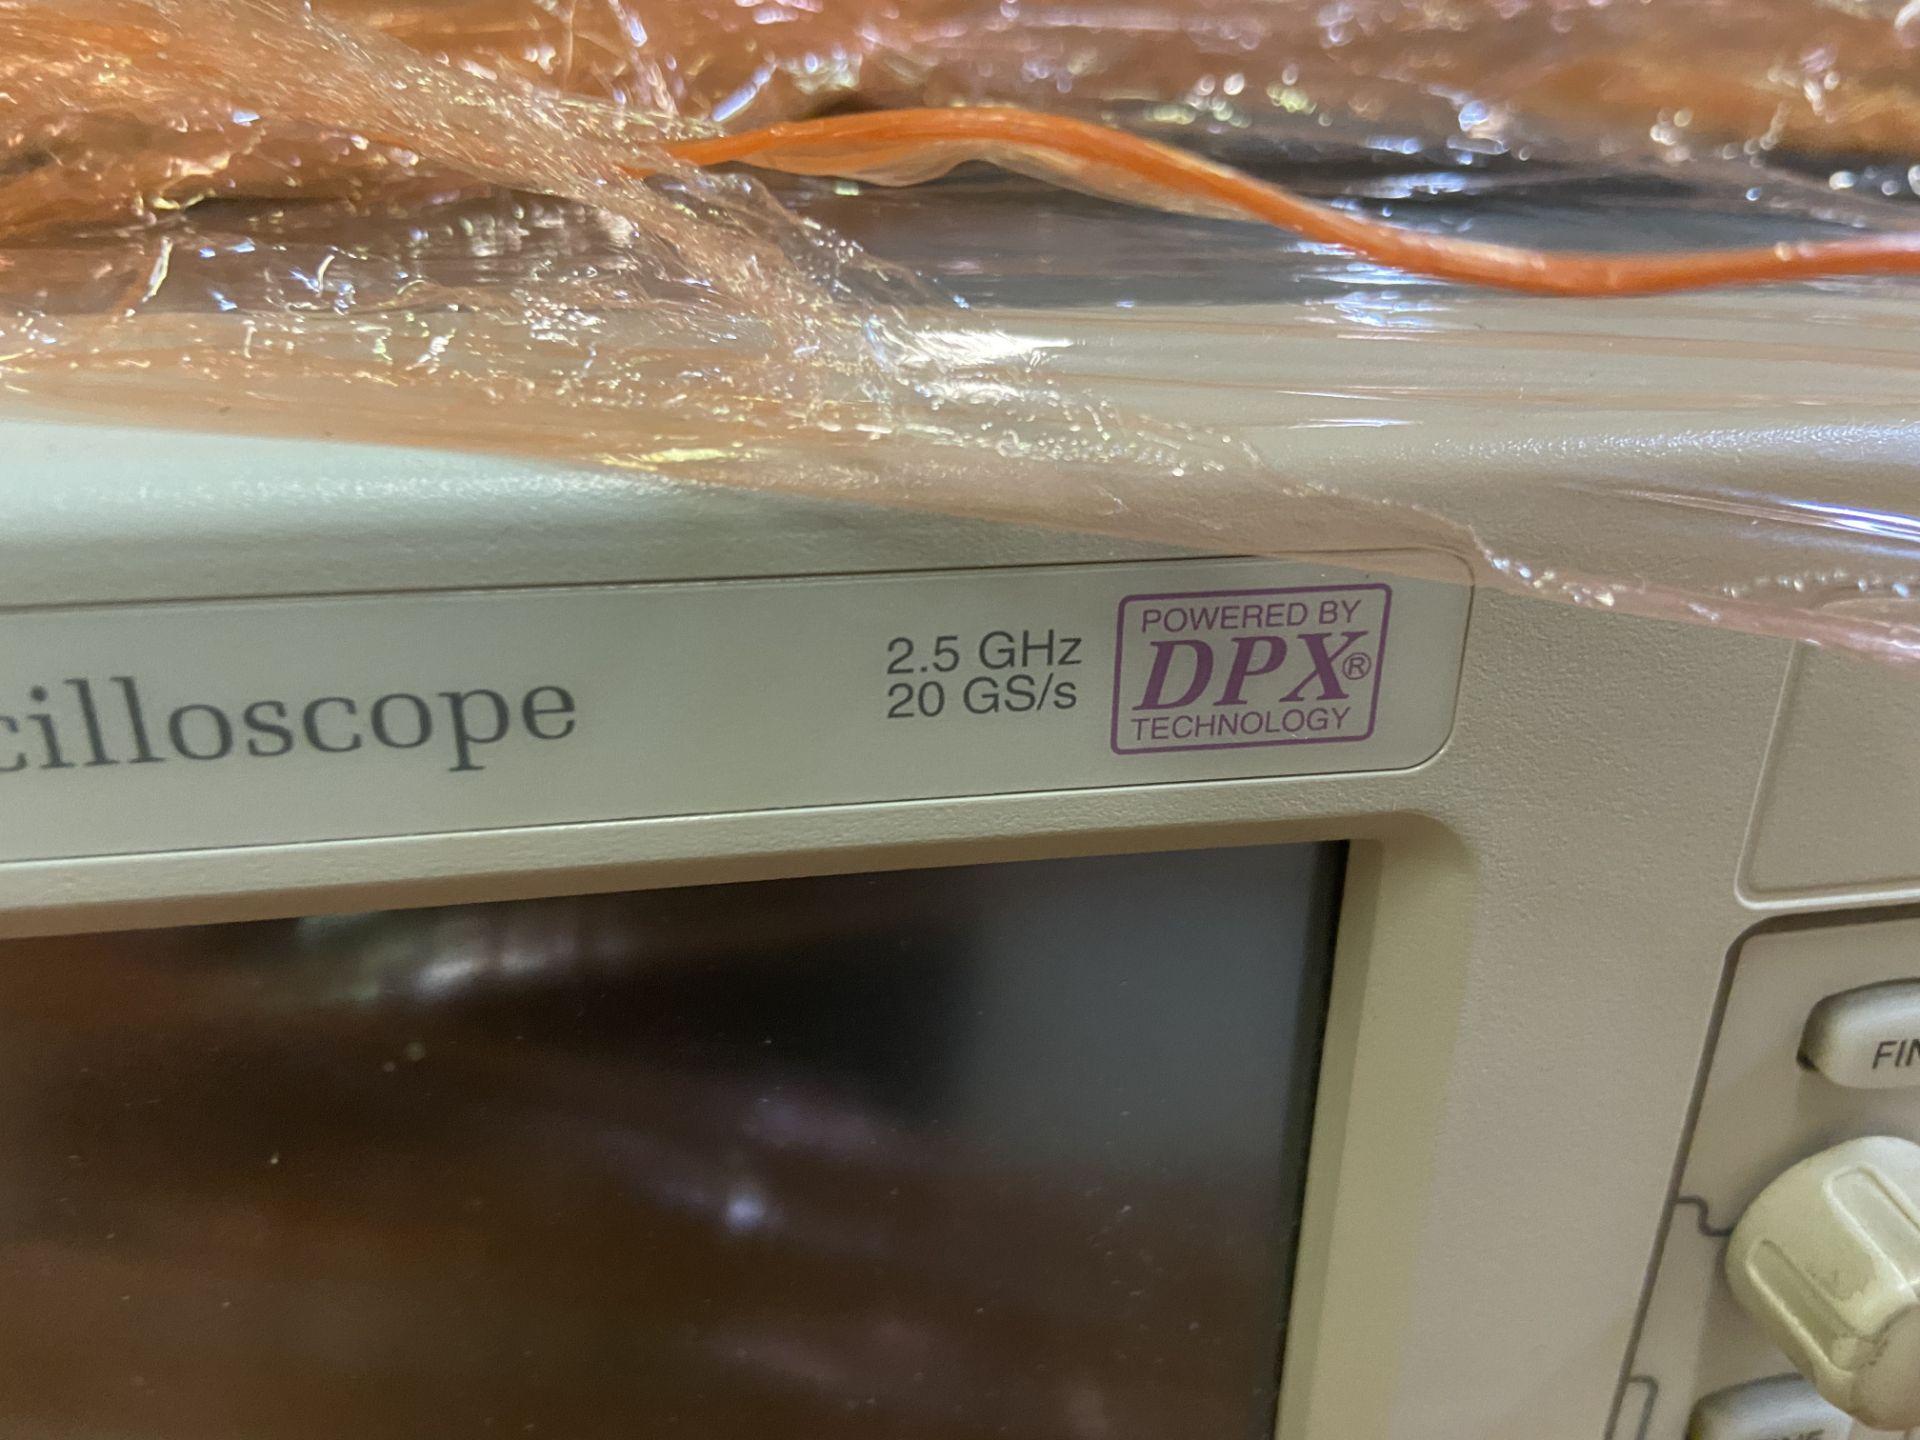 TDS7254B Tektronix Digital Oscilloscope, 2.5 GHz, 4 Channel, Rigging Fee: $50 - Image 2 of 4